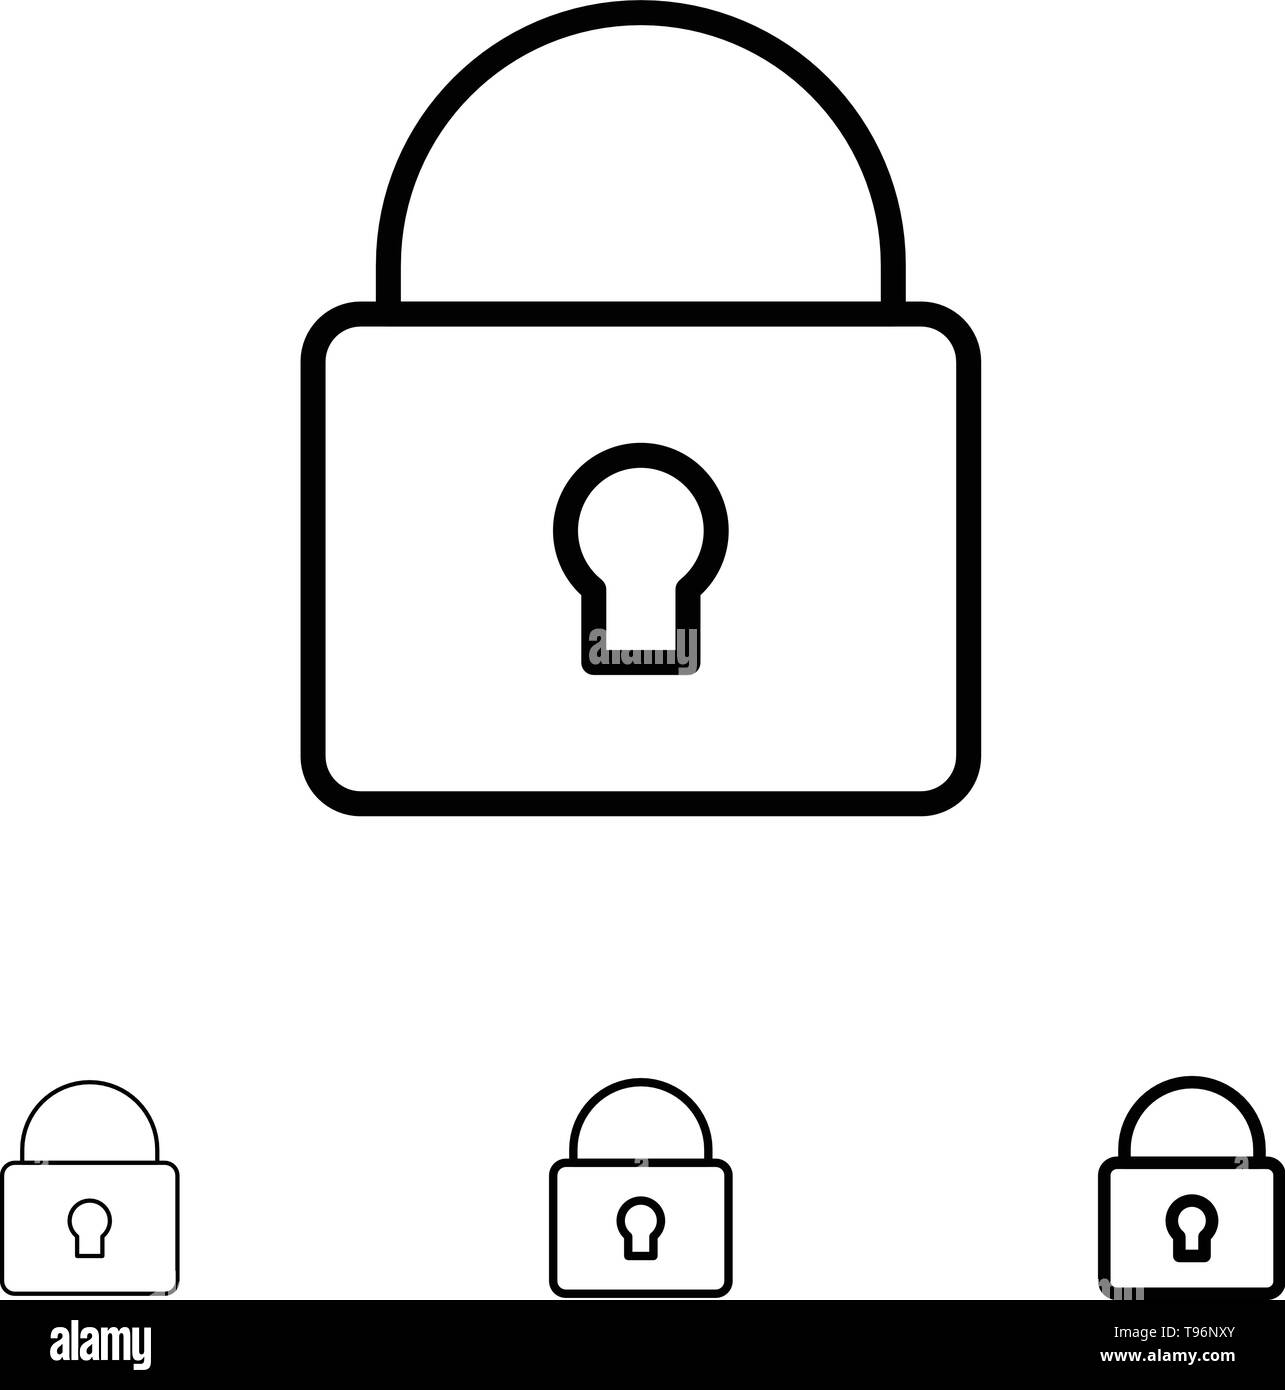 Lock, Security, Locked, Login Bold and thin black line icon set - Stock Image